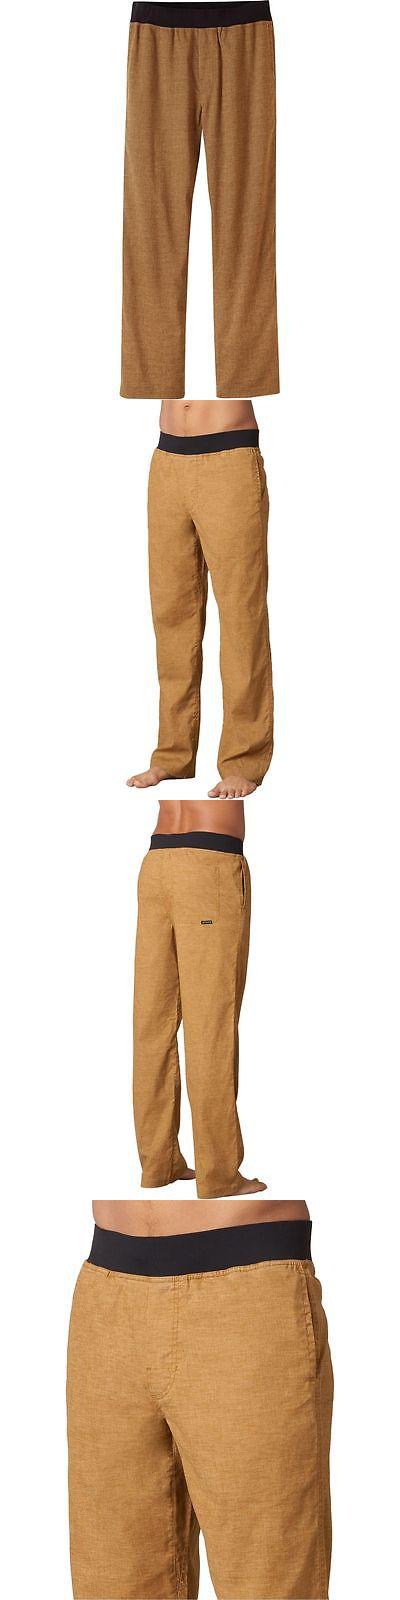 Clothing 101685: Prana Vaha Pant - Mens Dark Ginger Xl-34 BUY IT NOW ONLY: $78.95